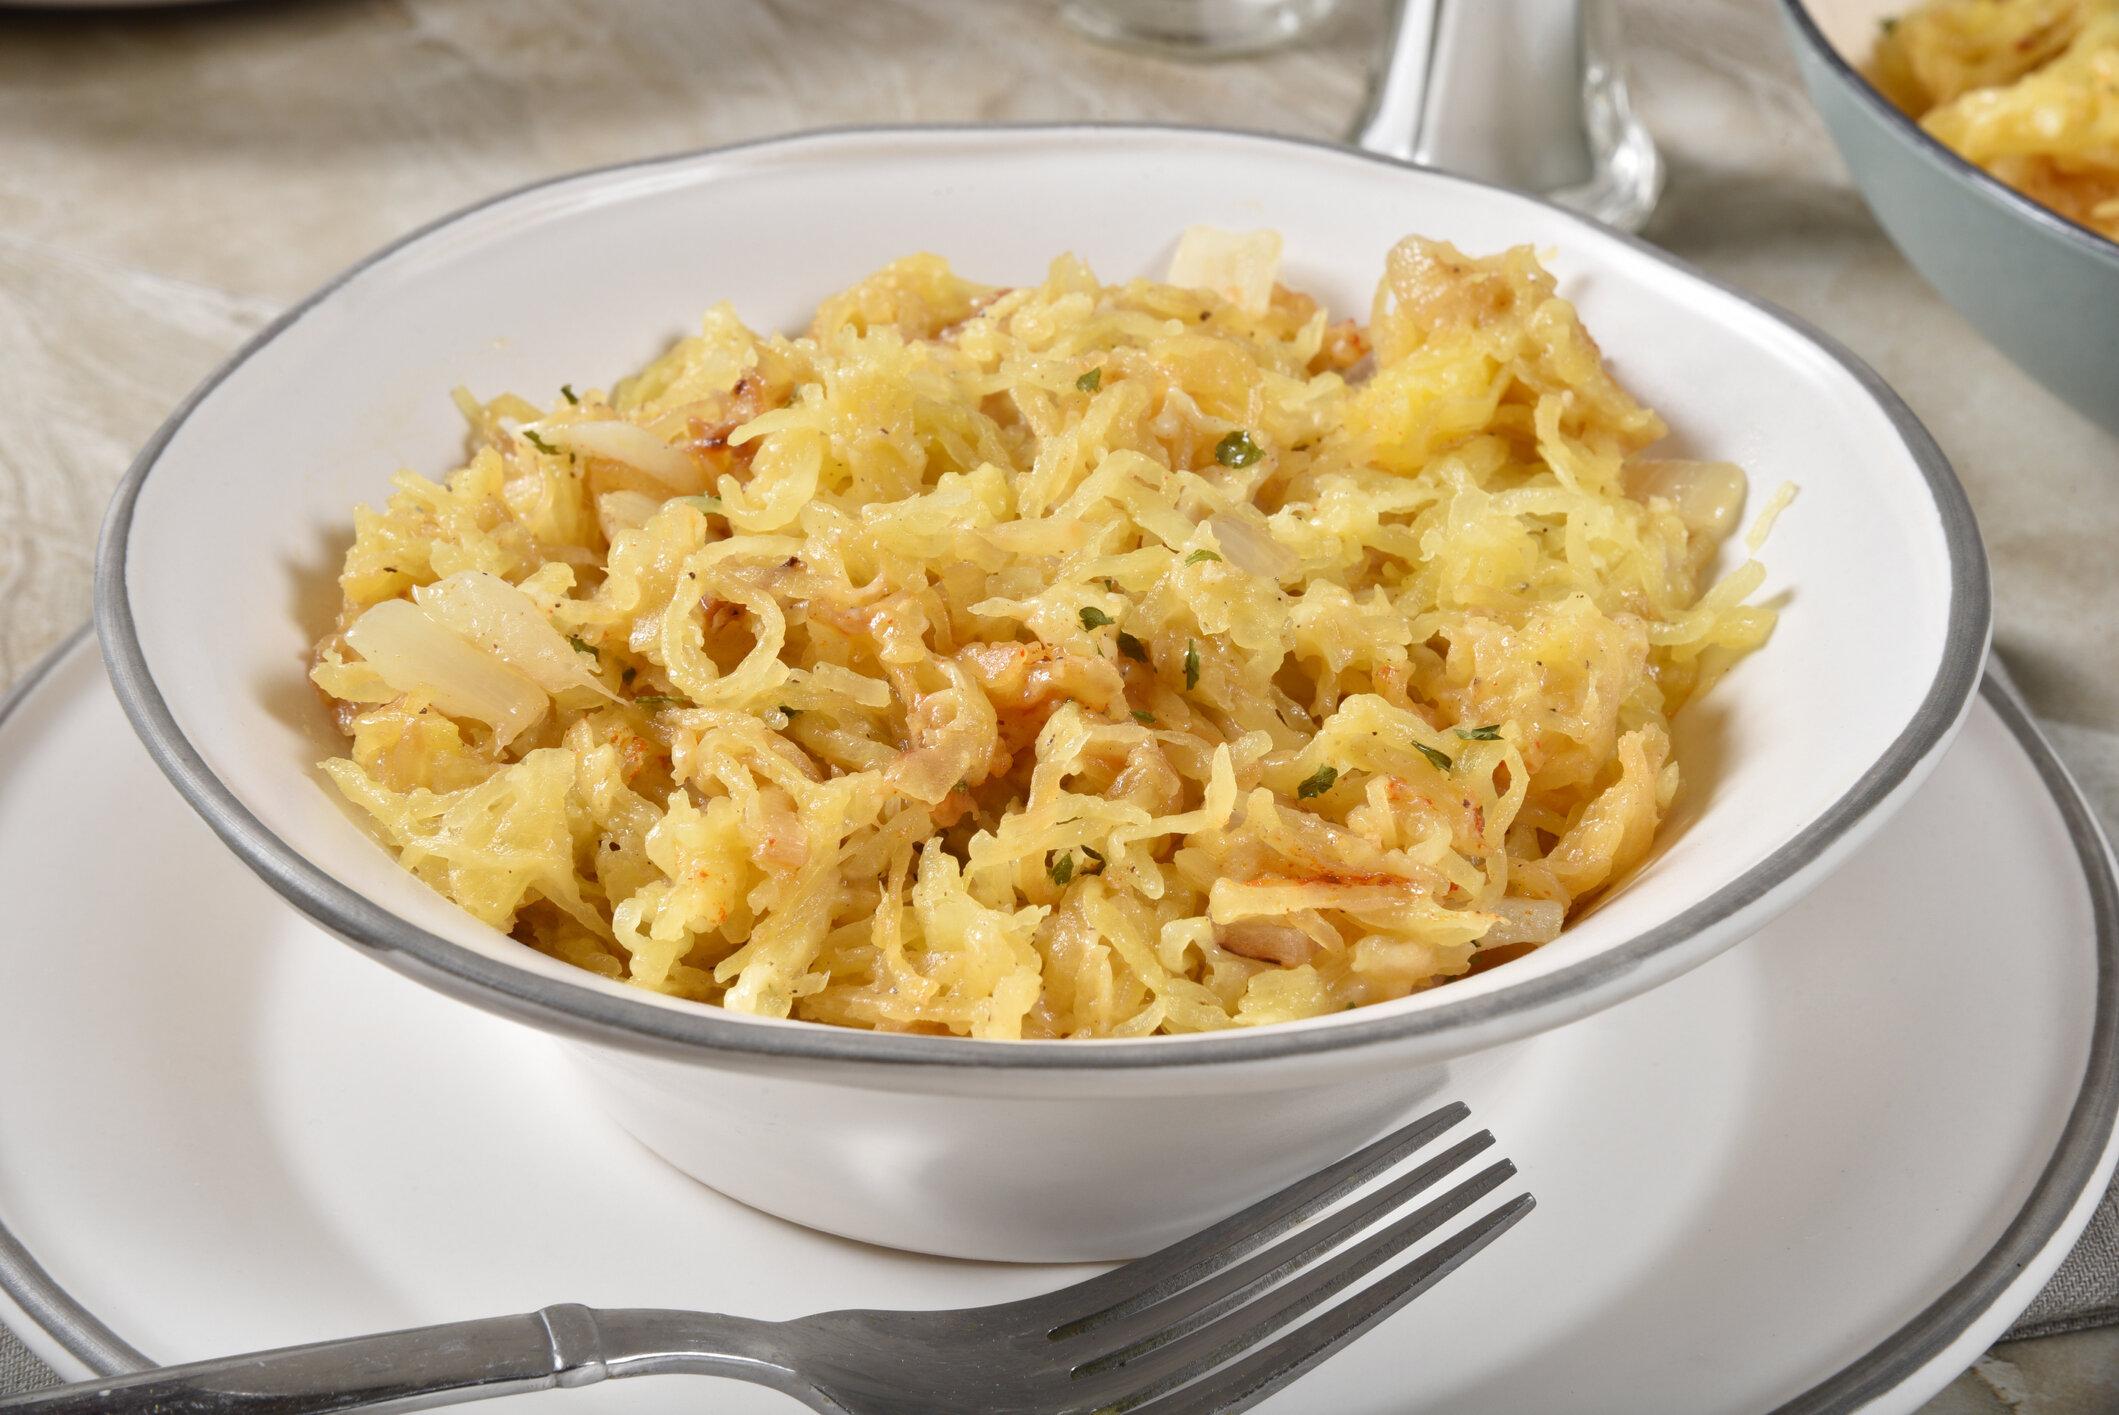 Garlic Parmesan Spaghetti Squash - Image Source: iStock